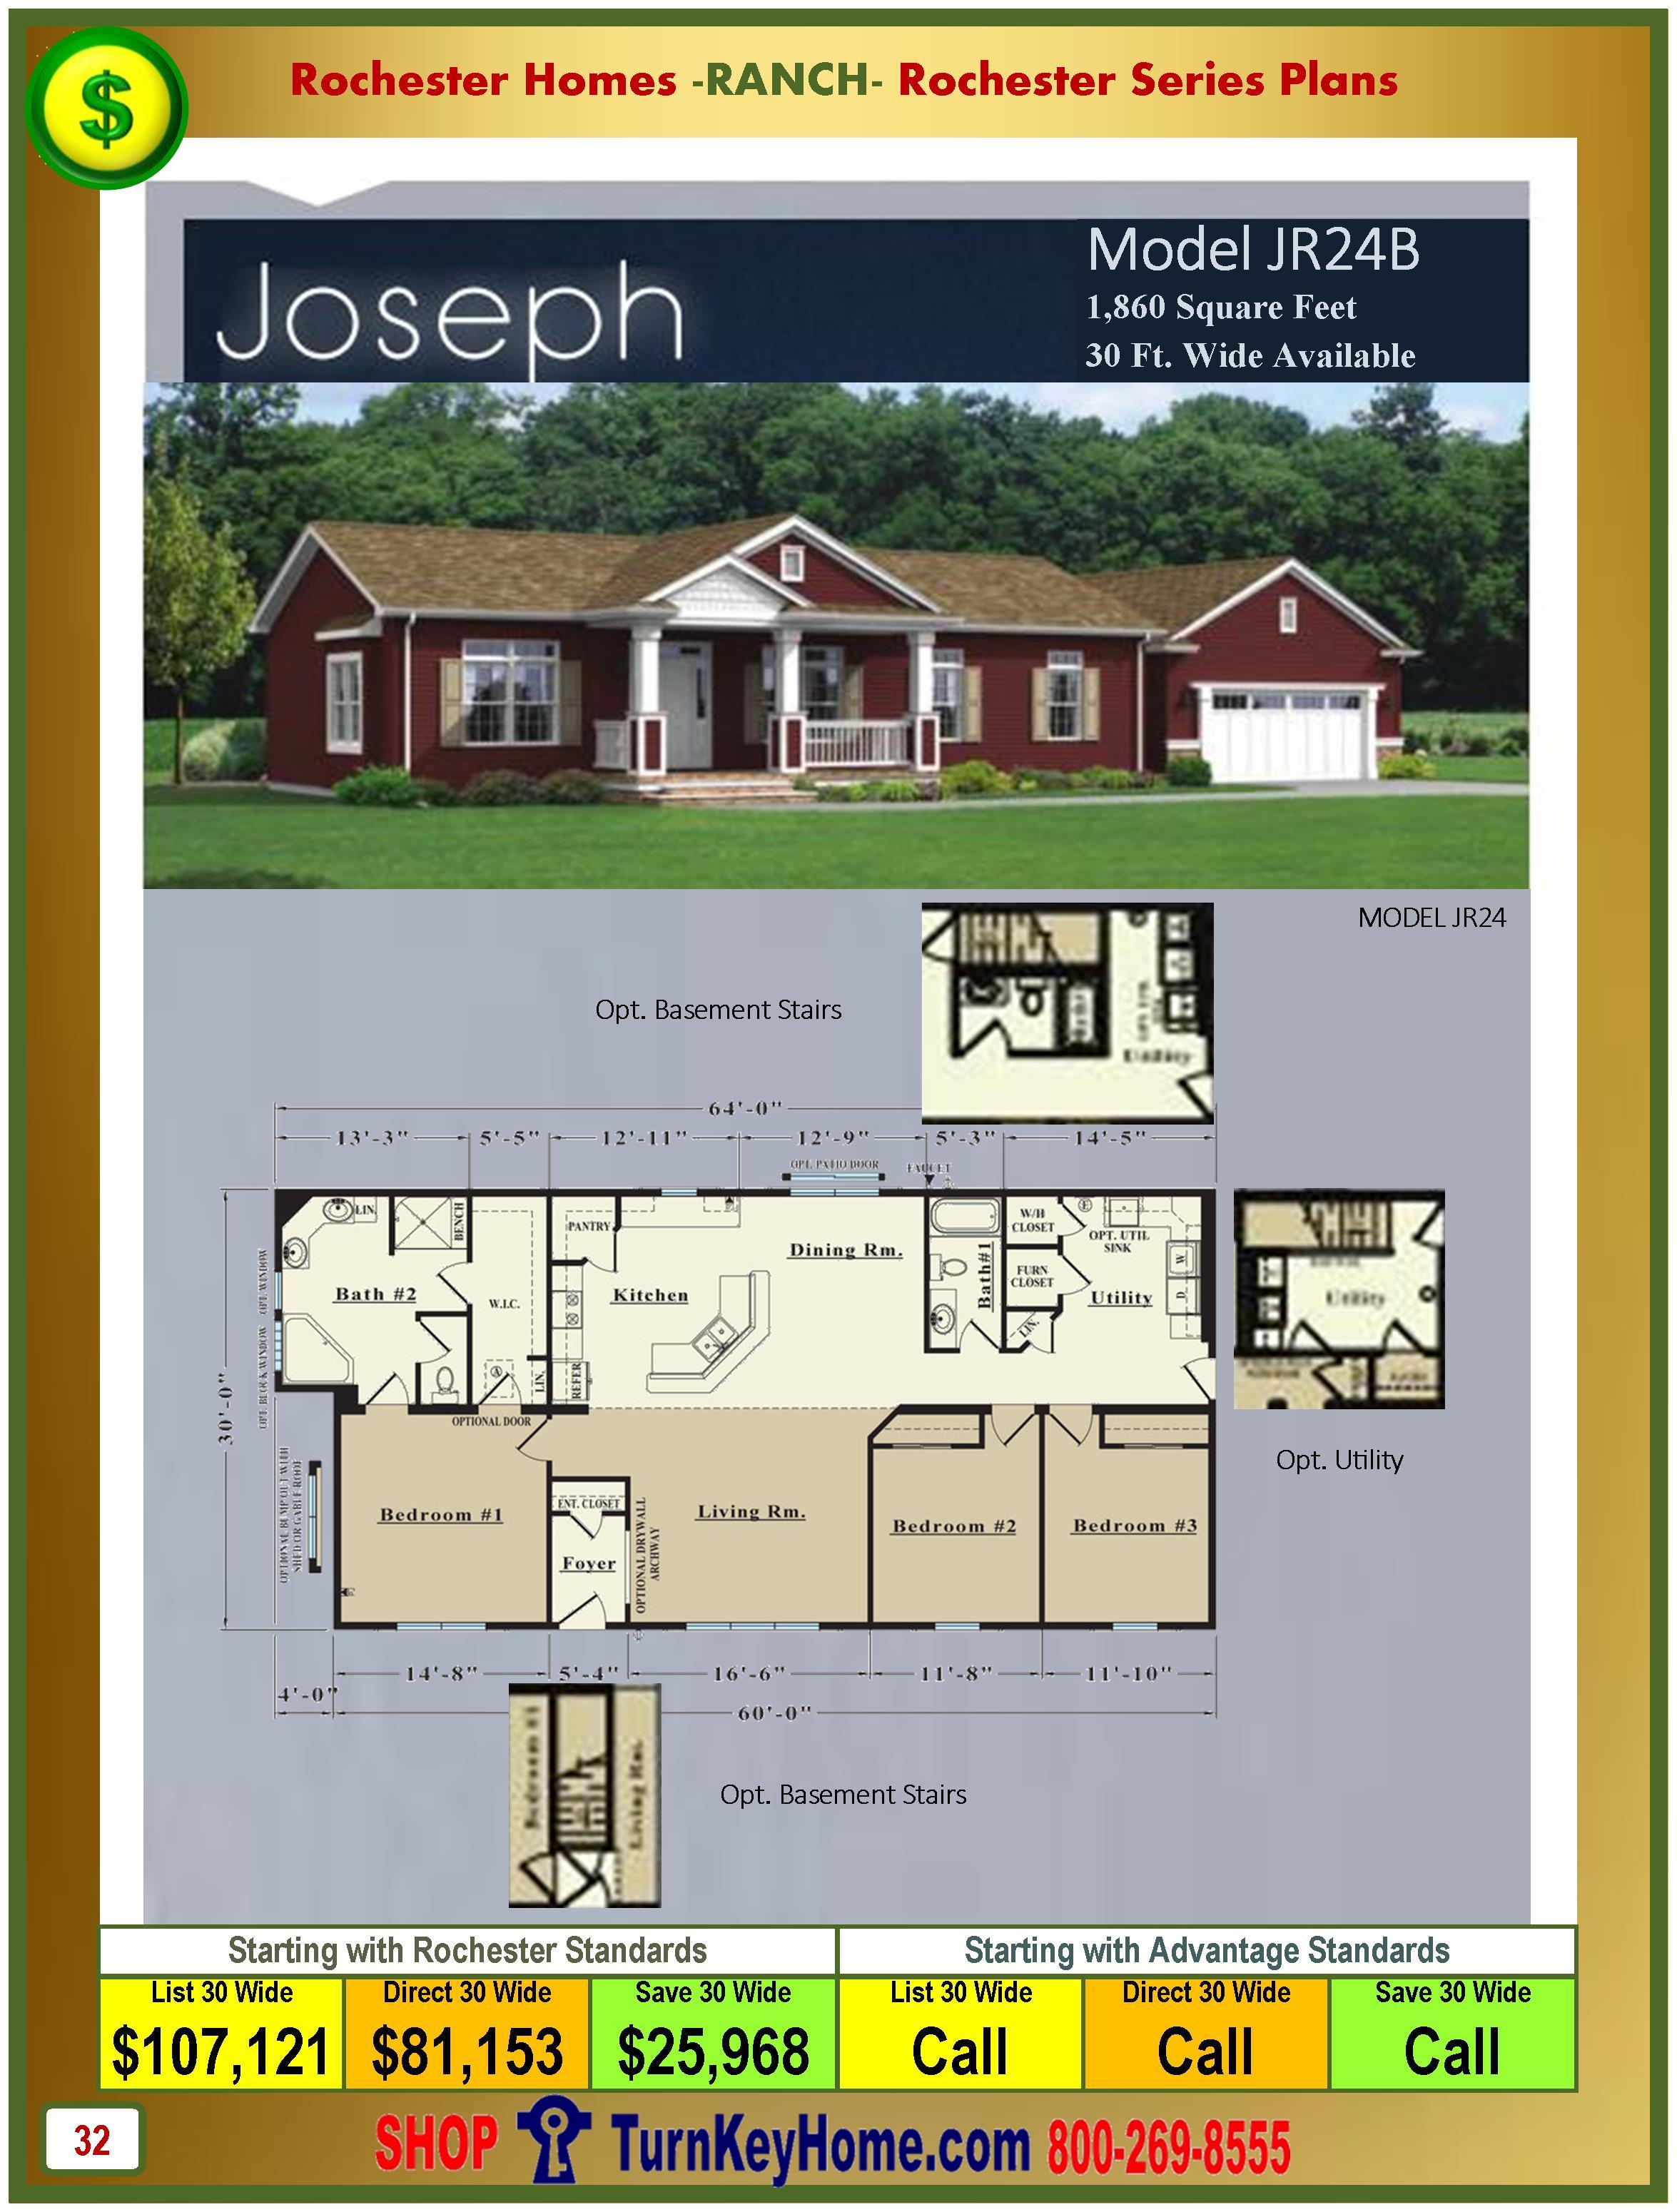 Modular Homes Rochester Home Inc Joseph JR24B Ranch. Ranch Home Plan and Price Catalog  Rochester Homes Indiana Modular